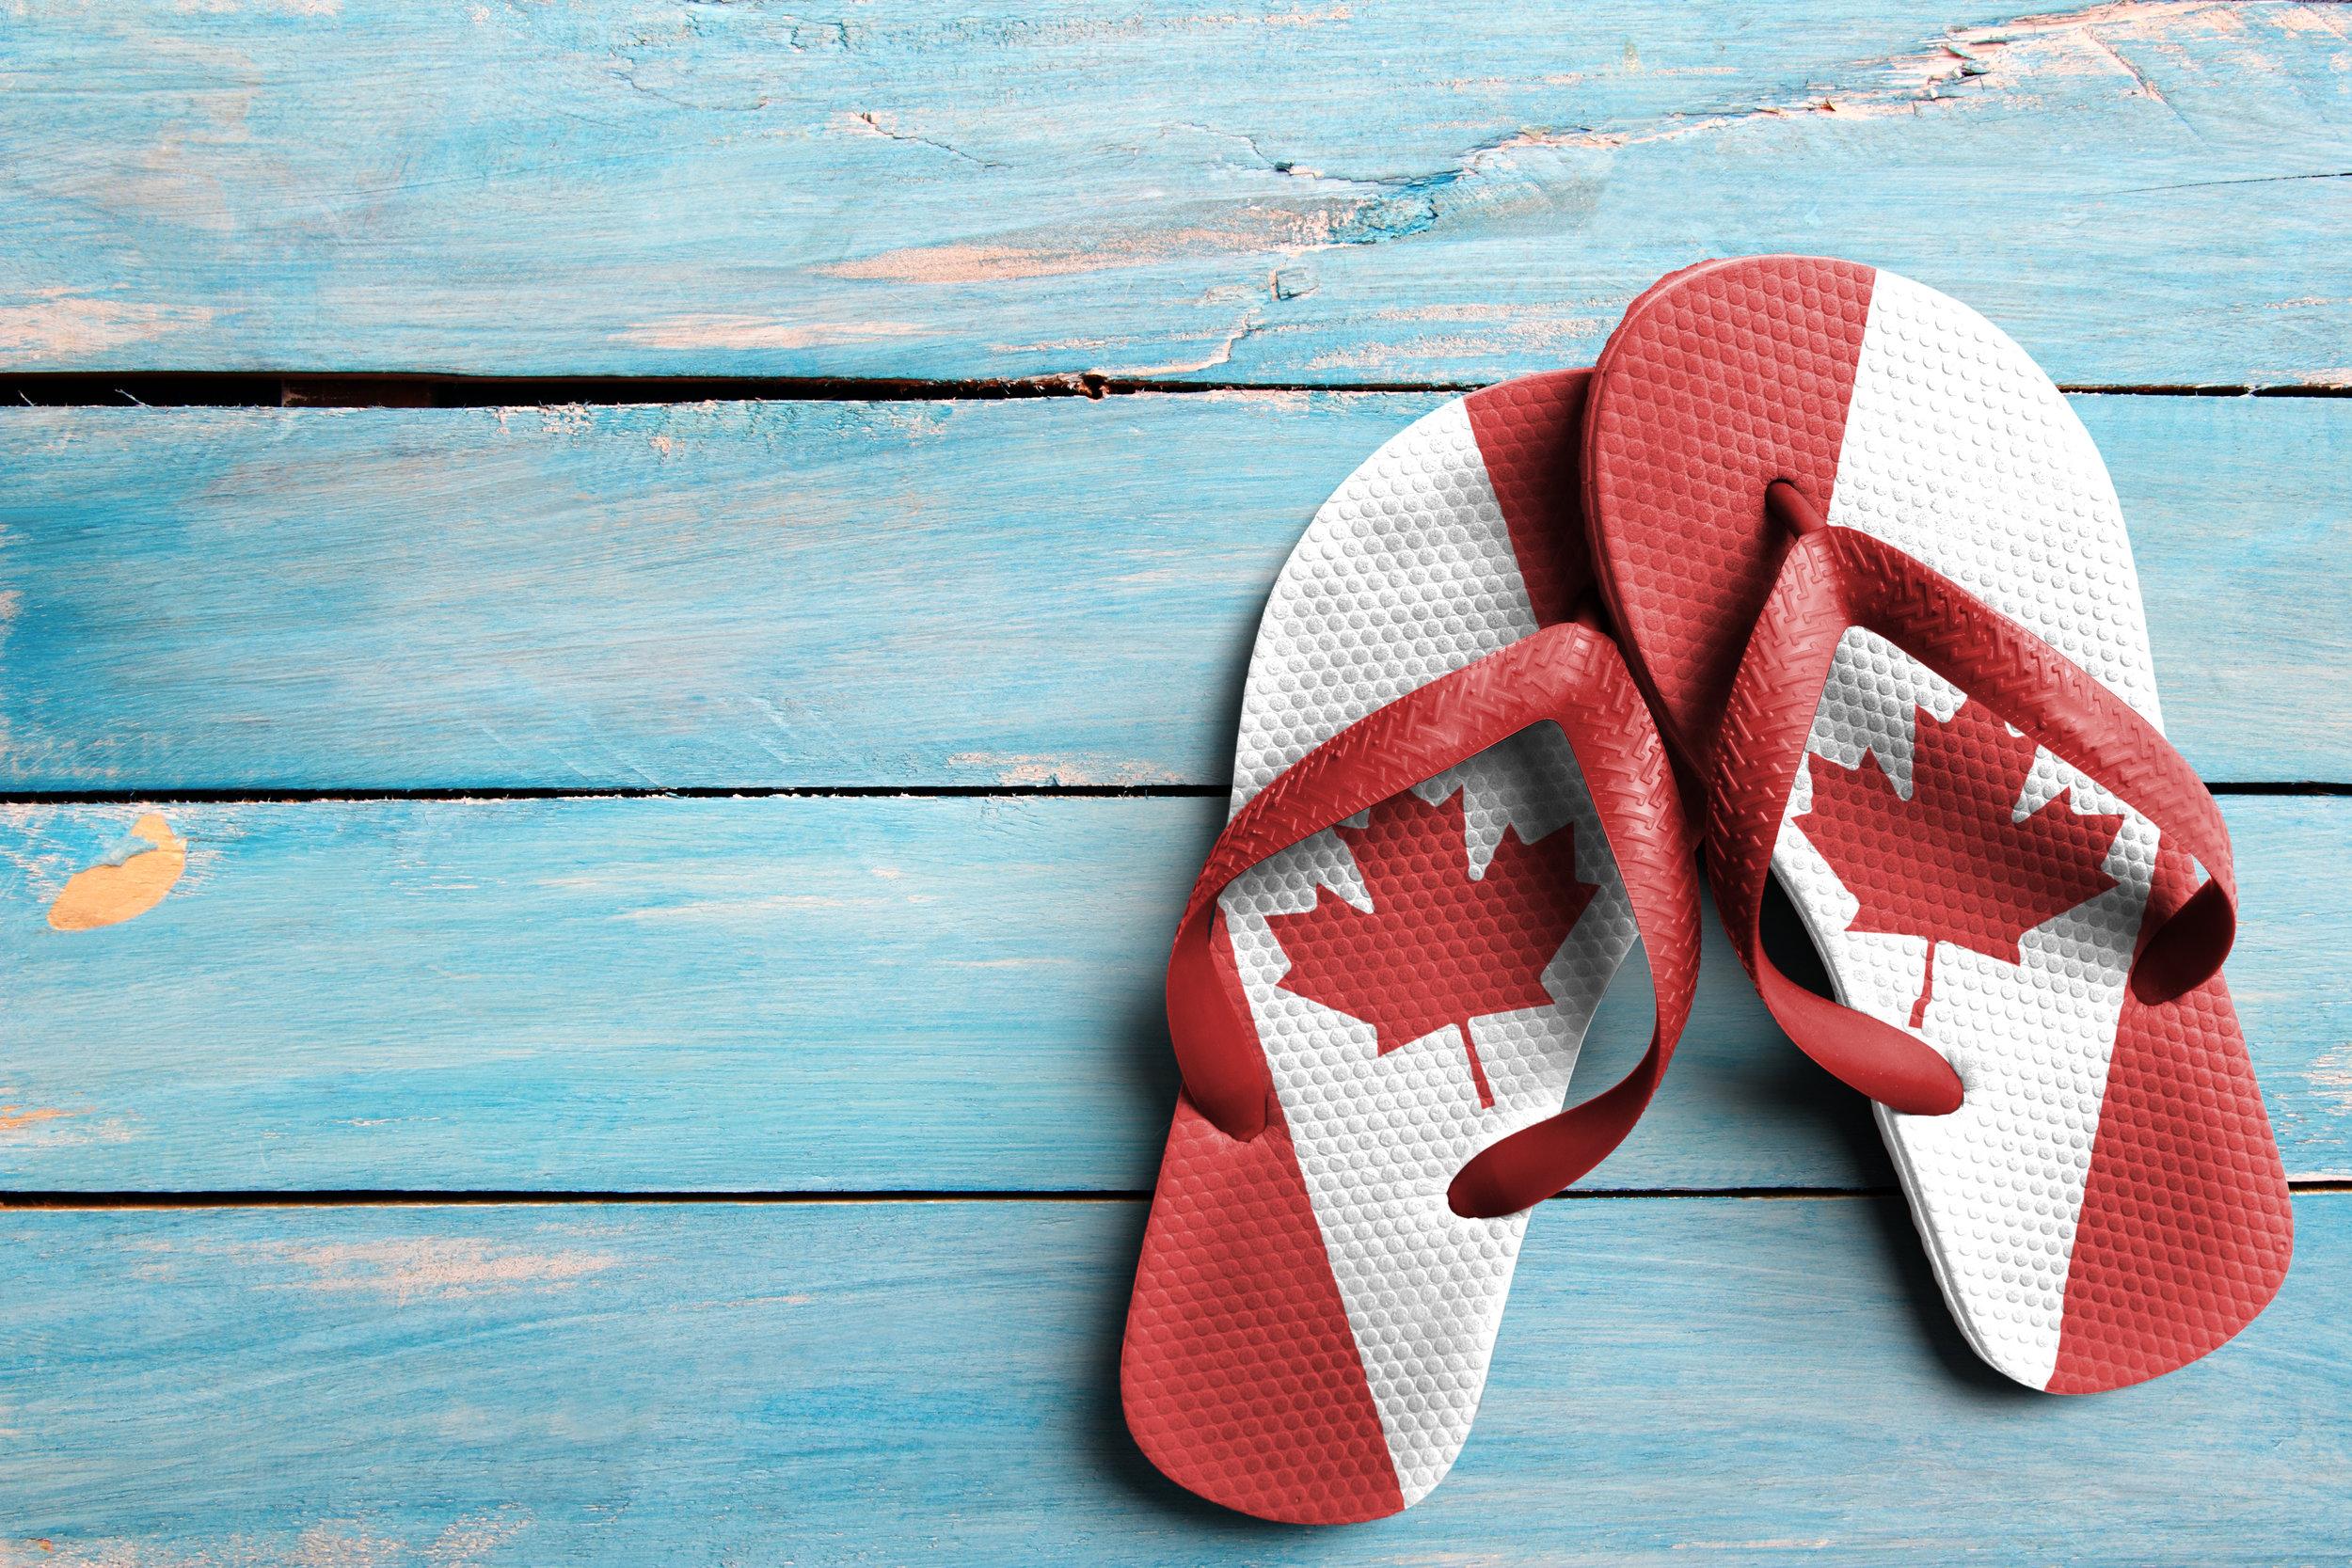 The Canada Summer Jobs program — Christian Legal Fellowship